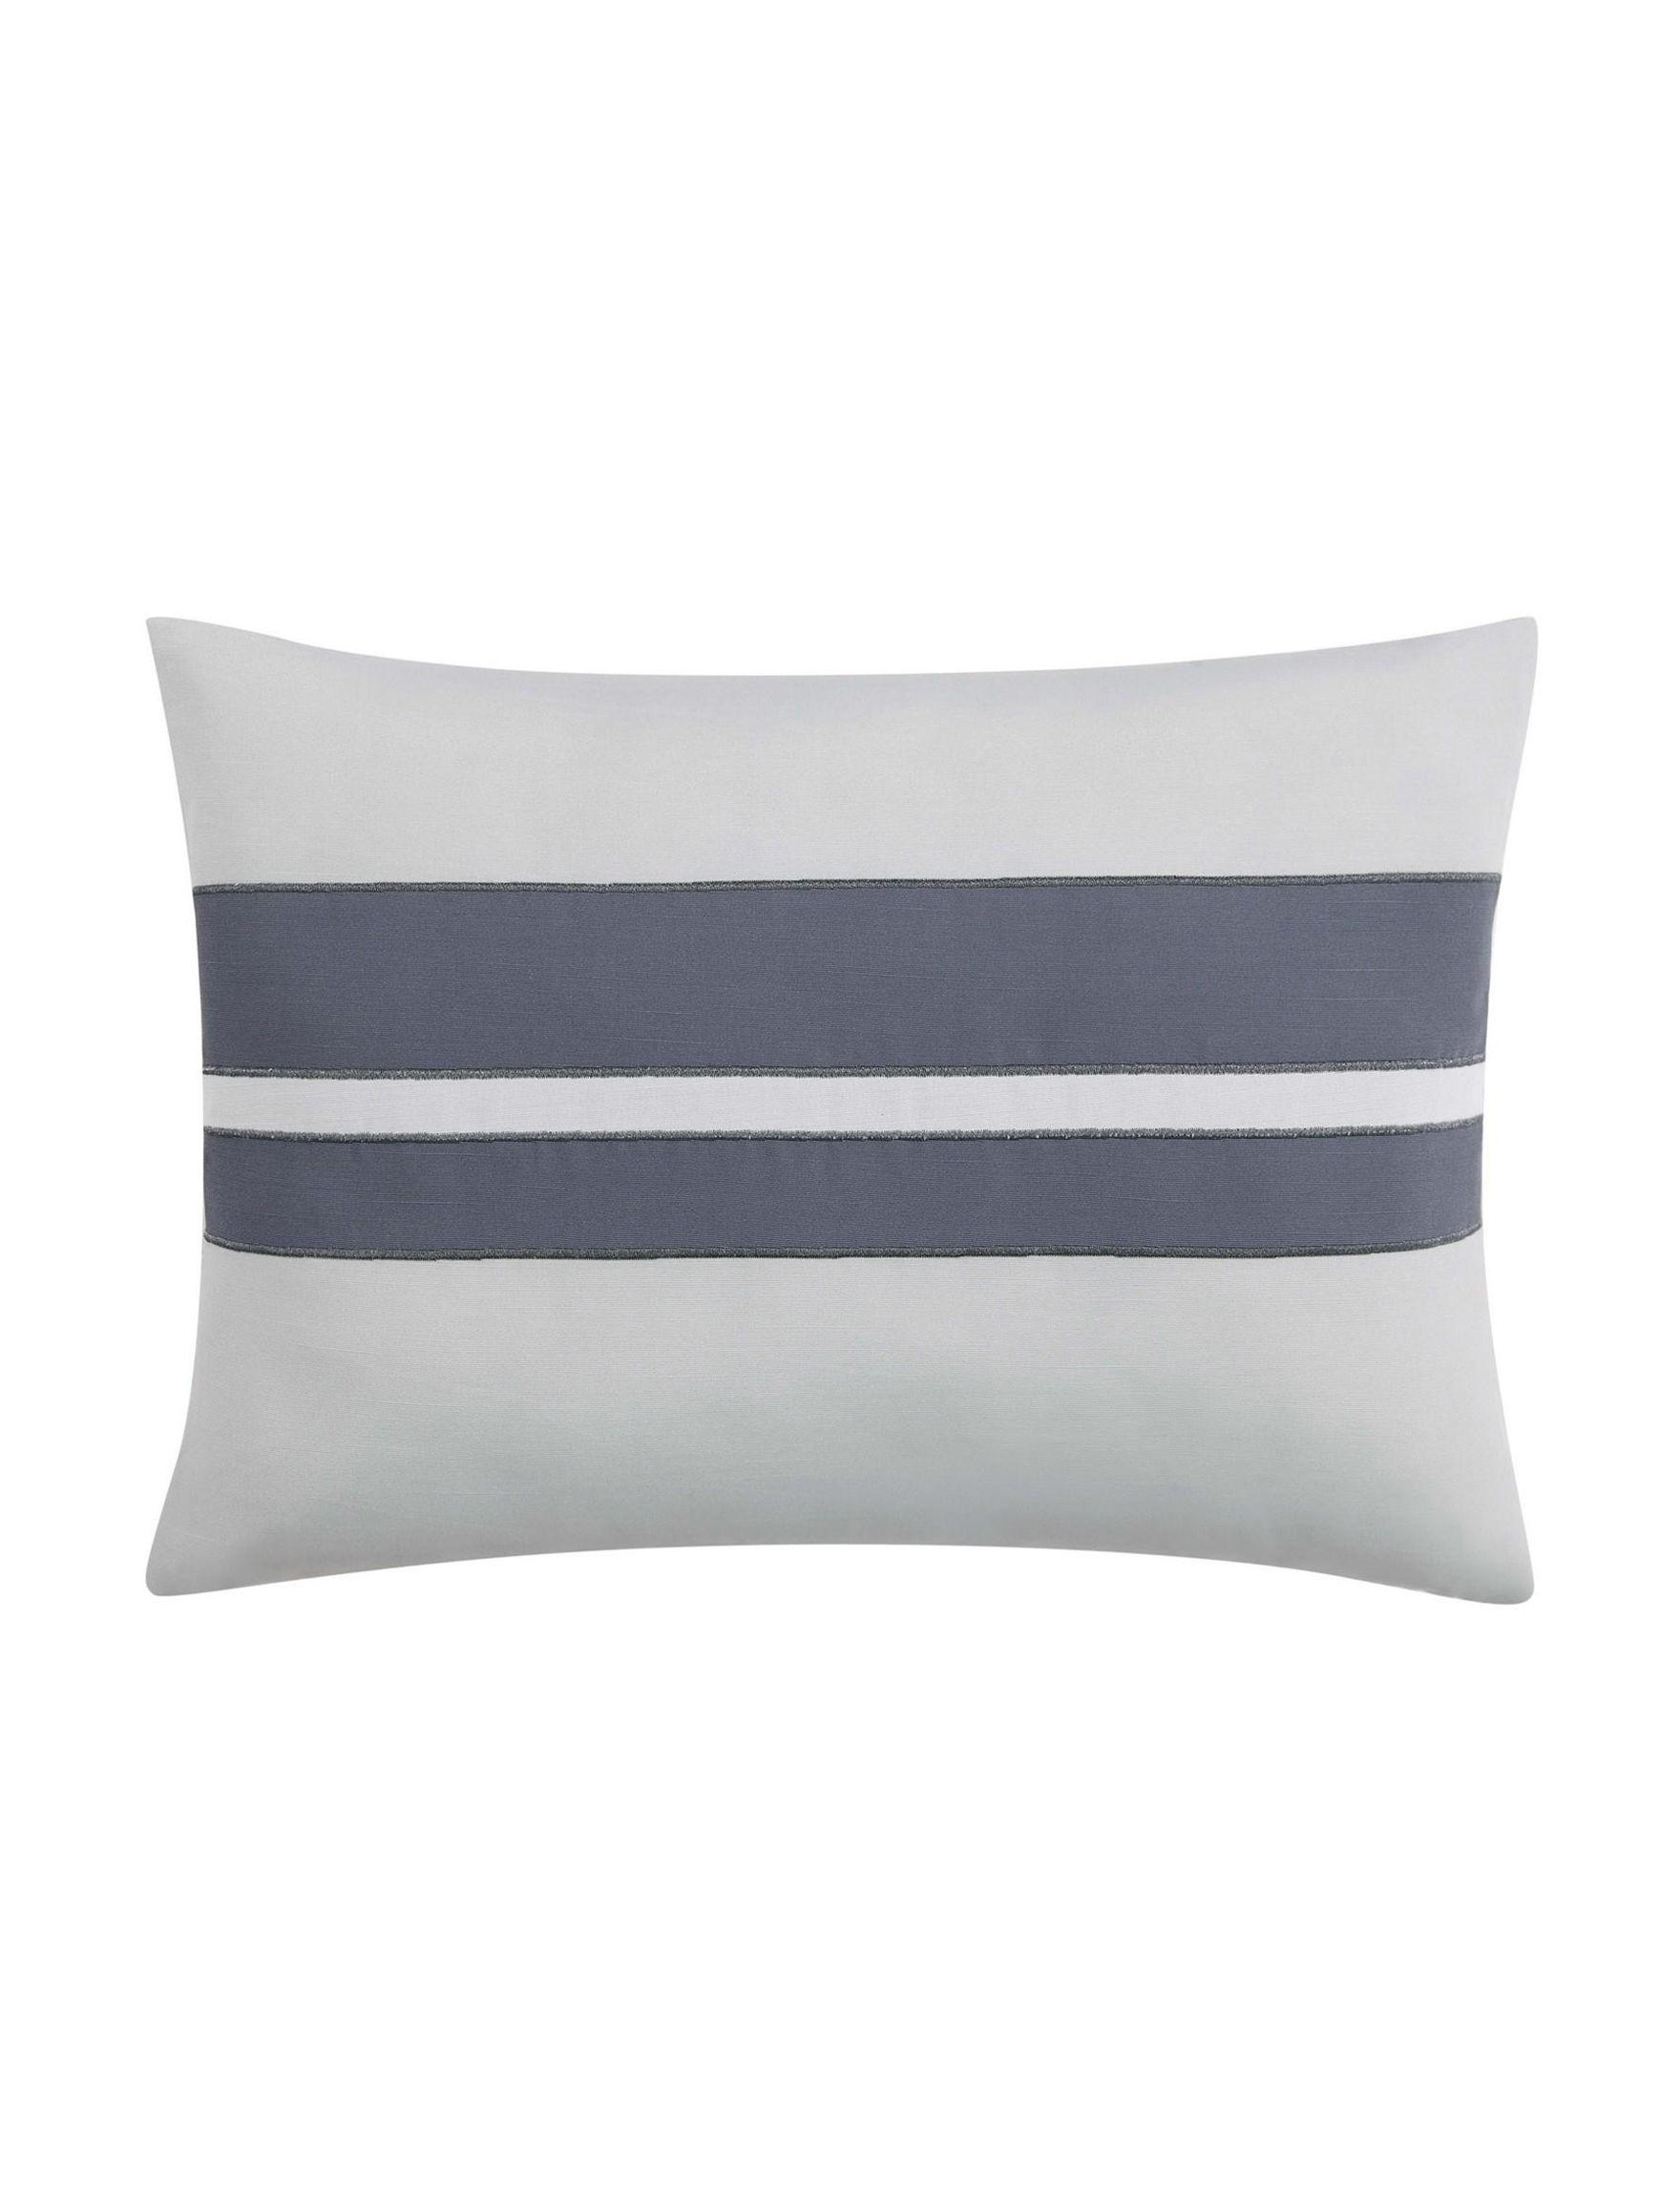 Vince Camuto Yellow/ Grey Decorative Pillows